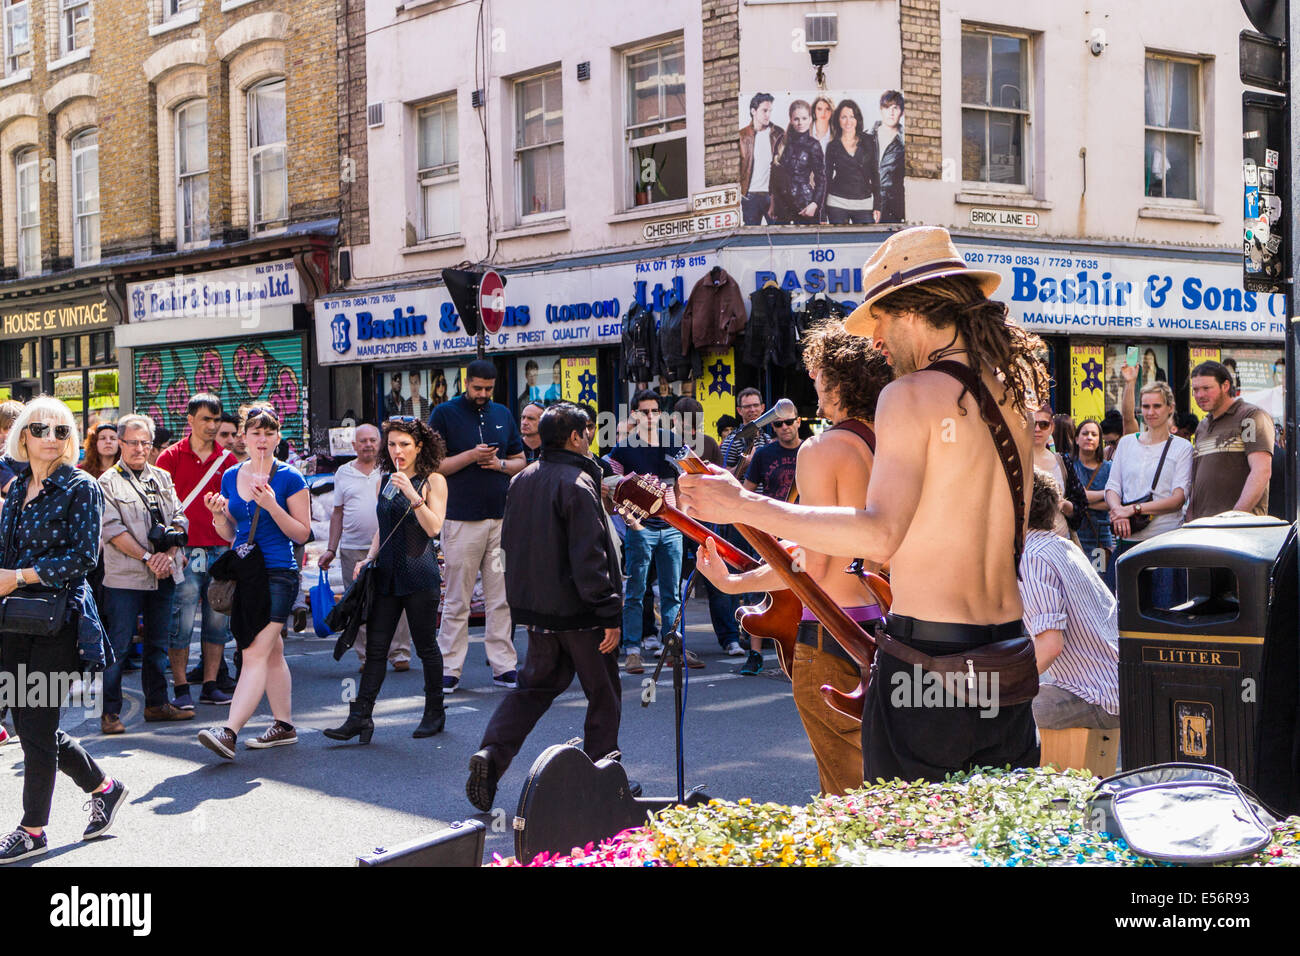 Street entertainers on Brick Lane - London - Stock Image